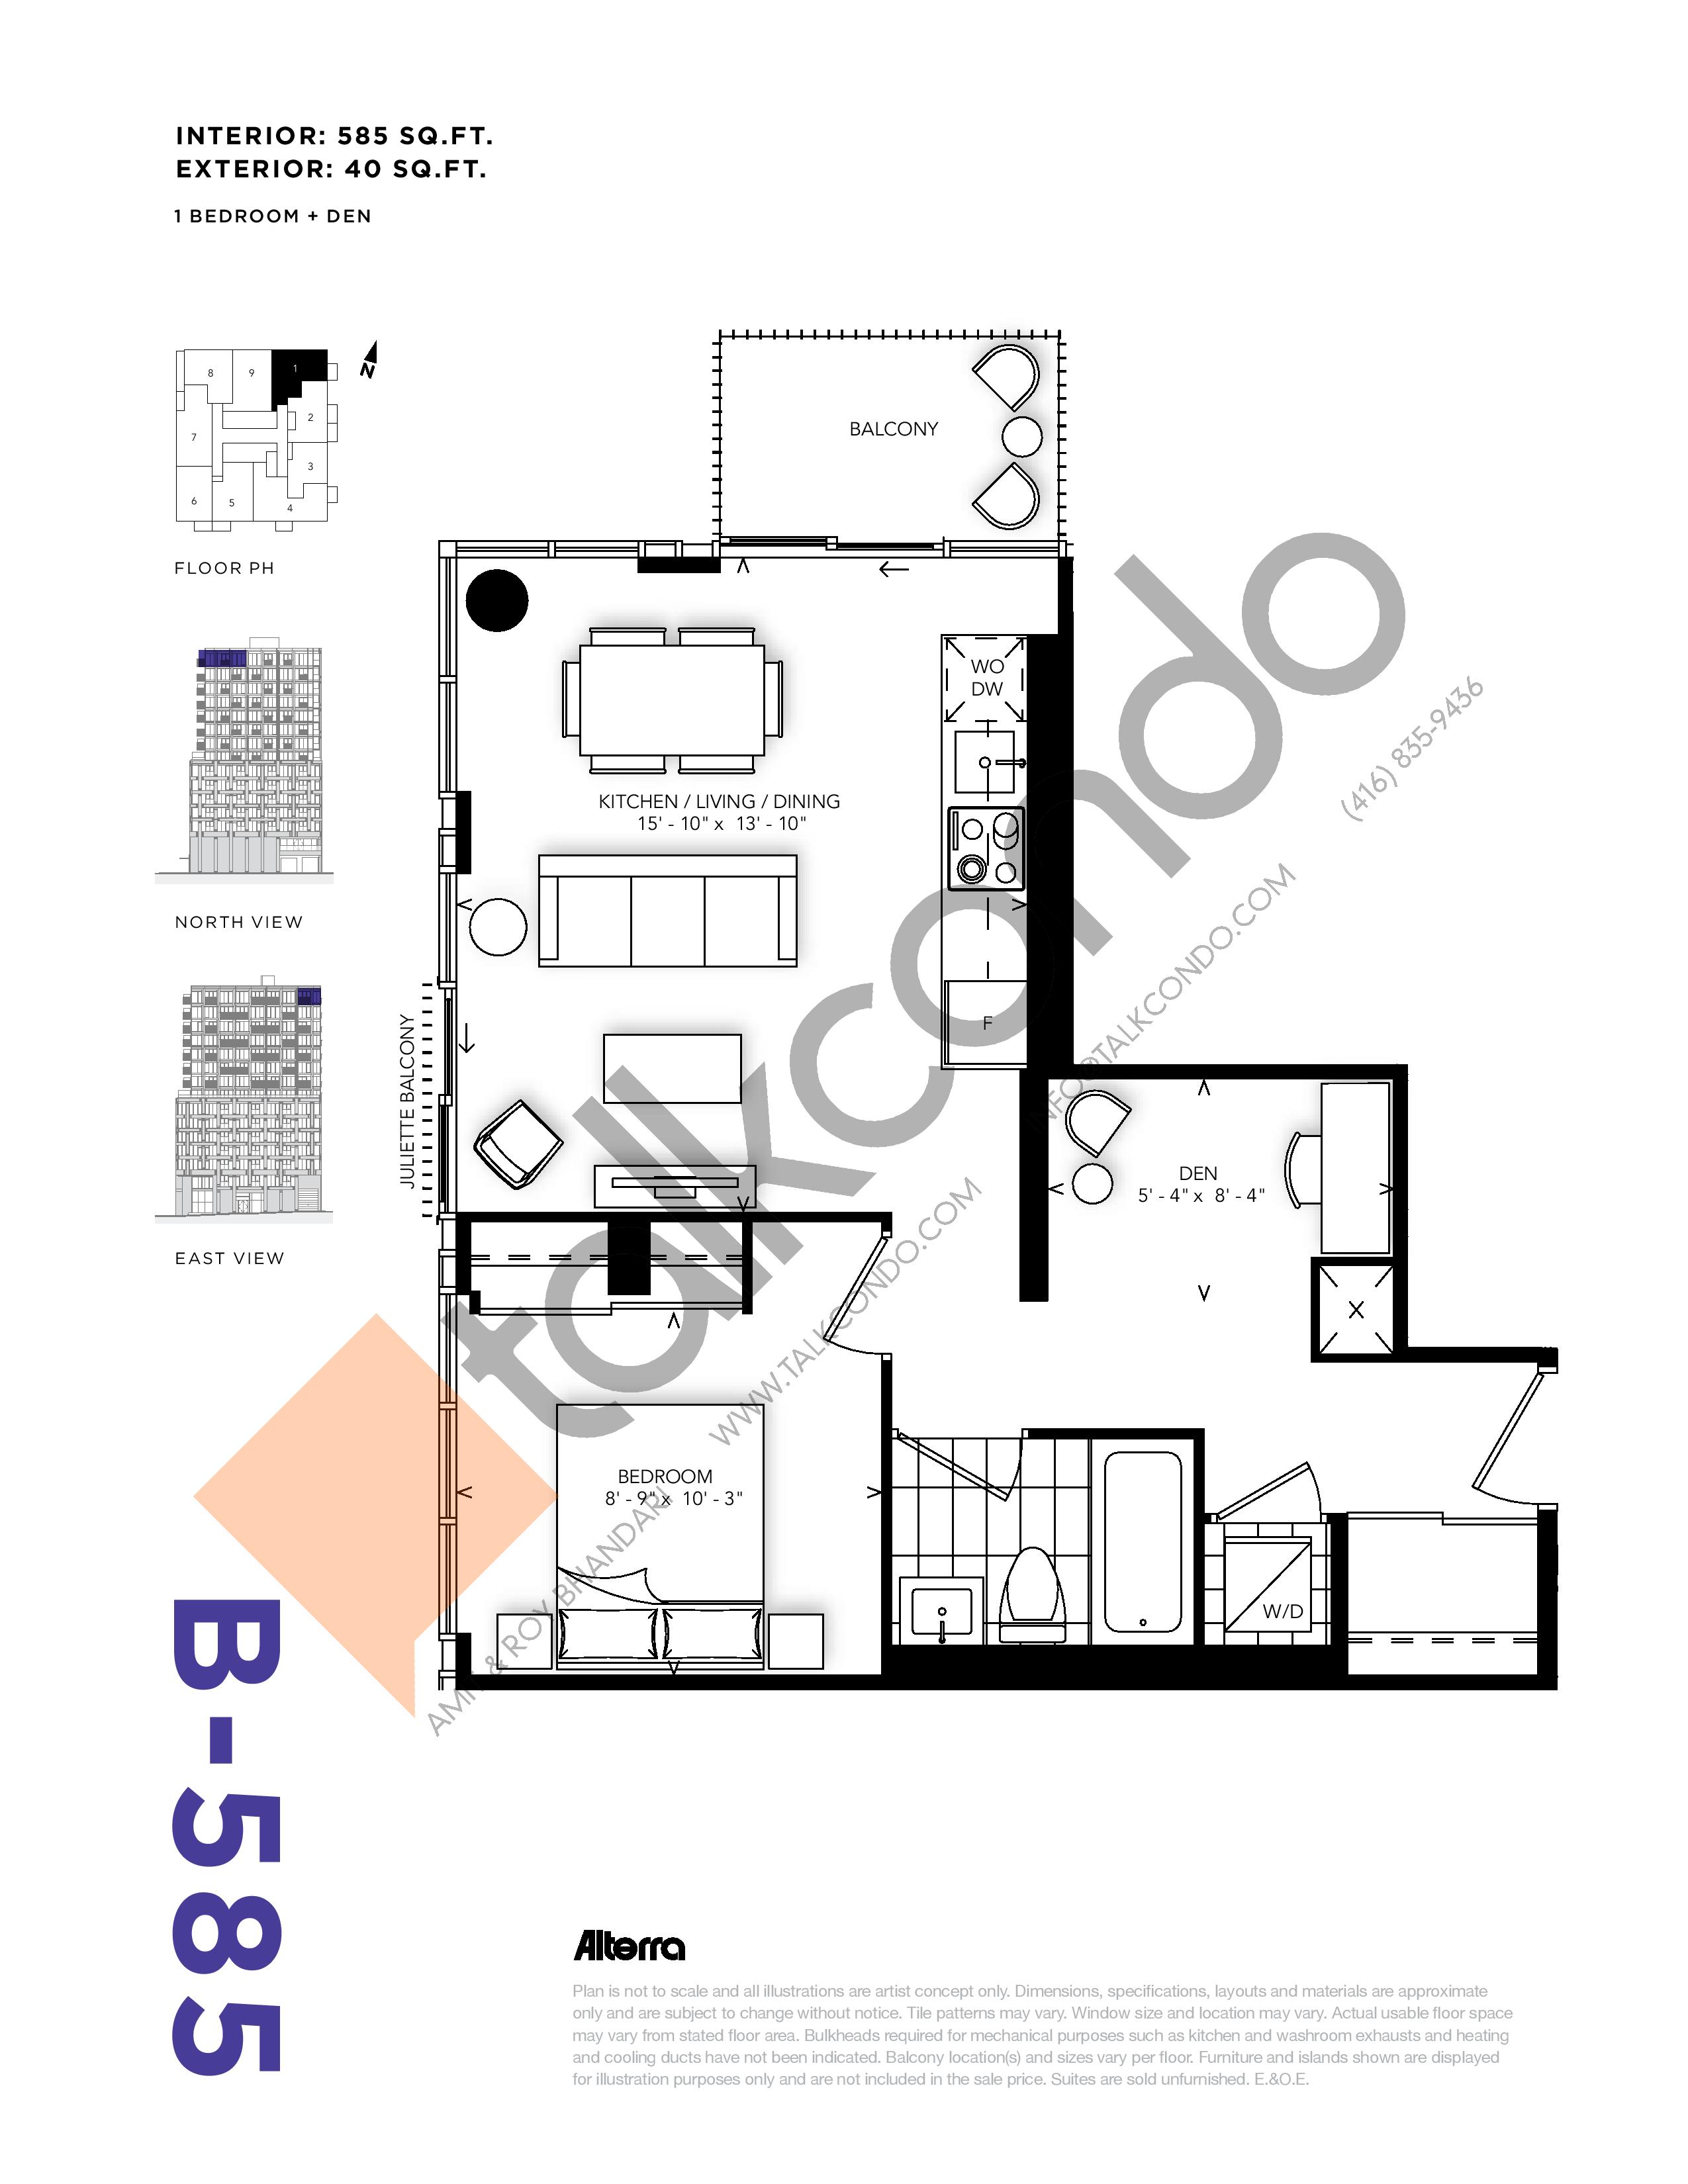 B-585 Floor Plan at RUSH Condos - 585 sq.ft